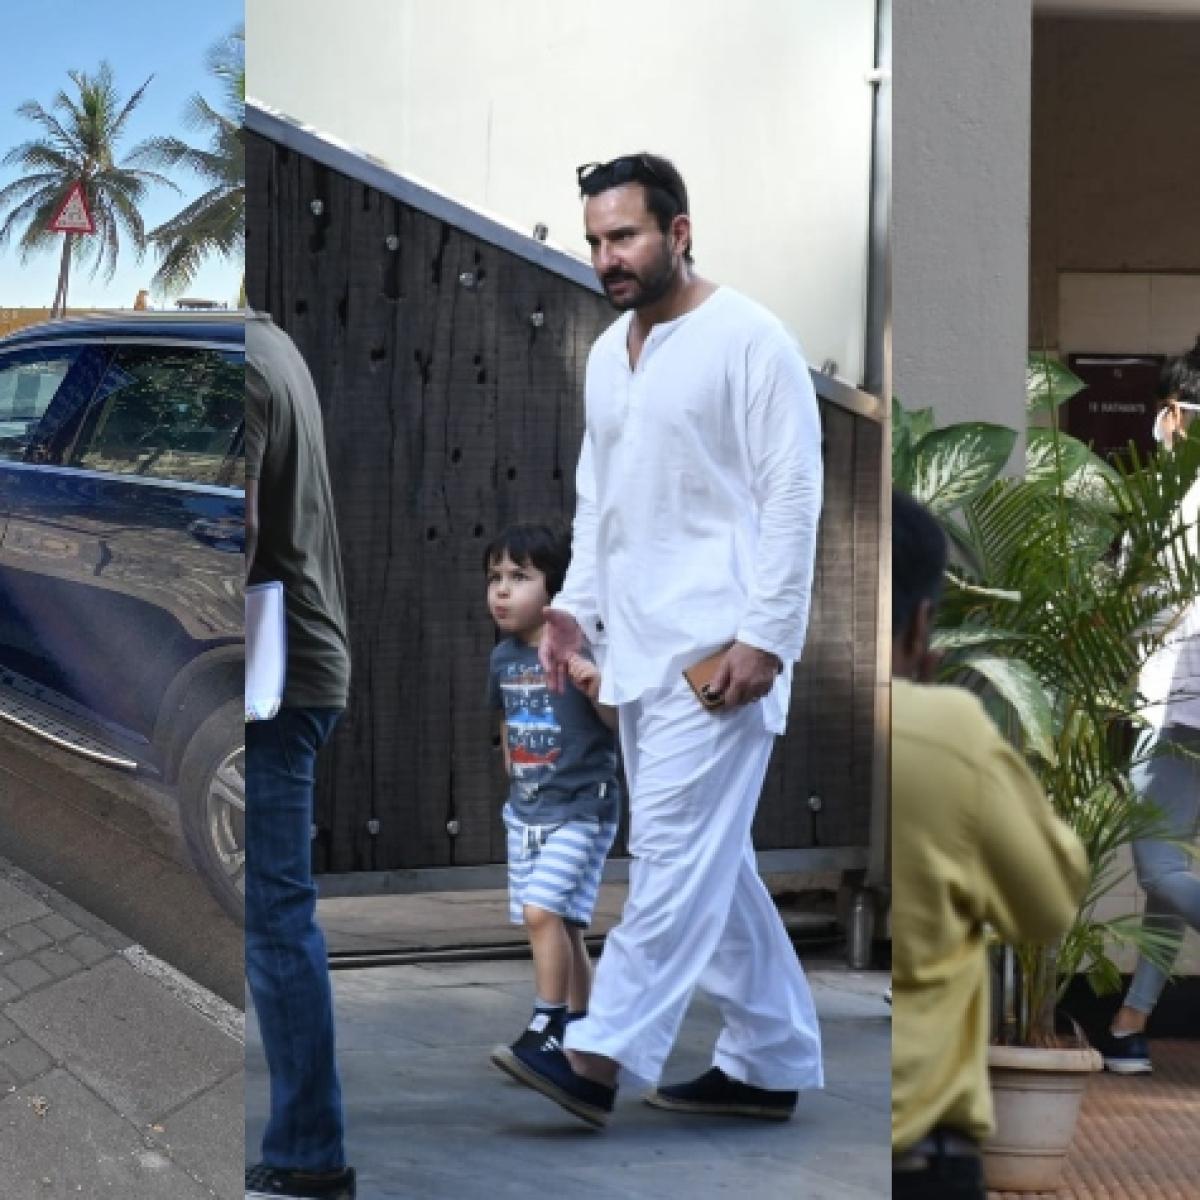 No social distancing for B-town's demigods: Katrina Kaif, Taimur, Saif Ali Khan and others step out amid coronavirus lockdown